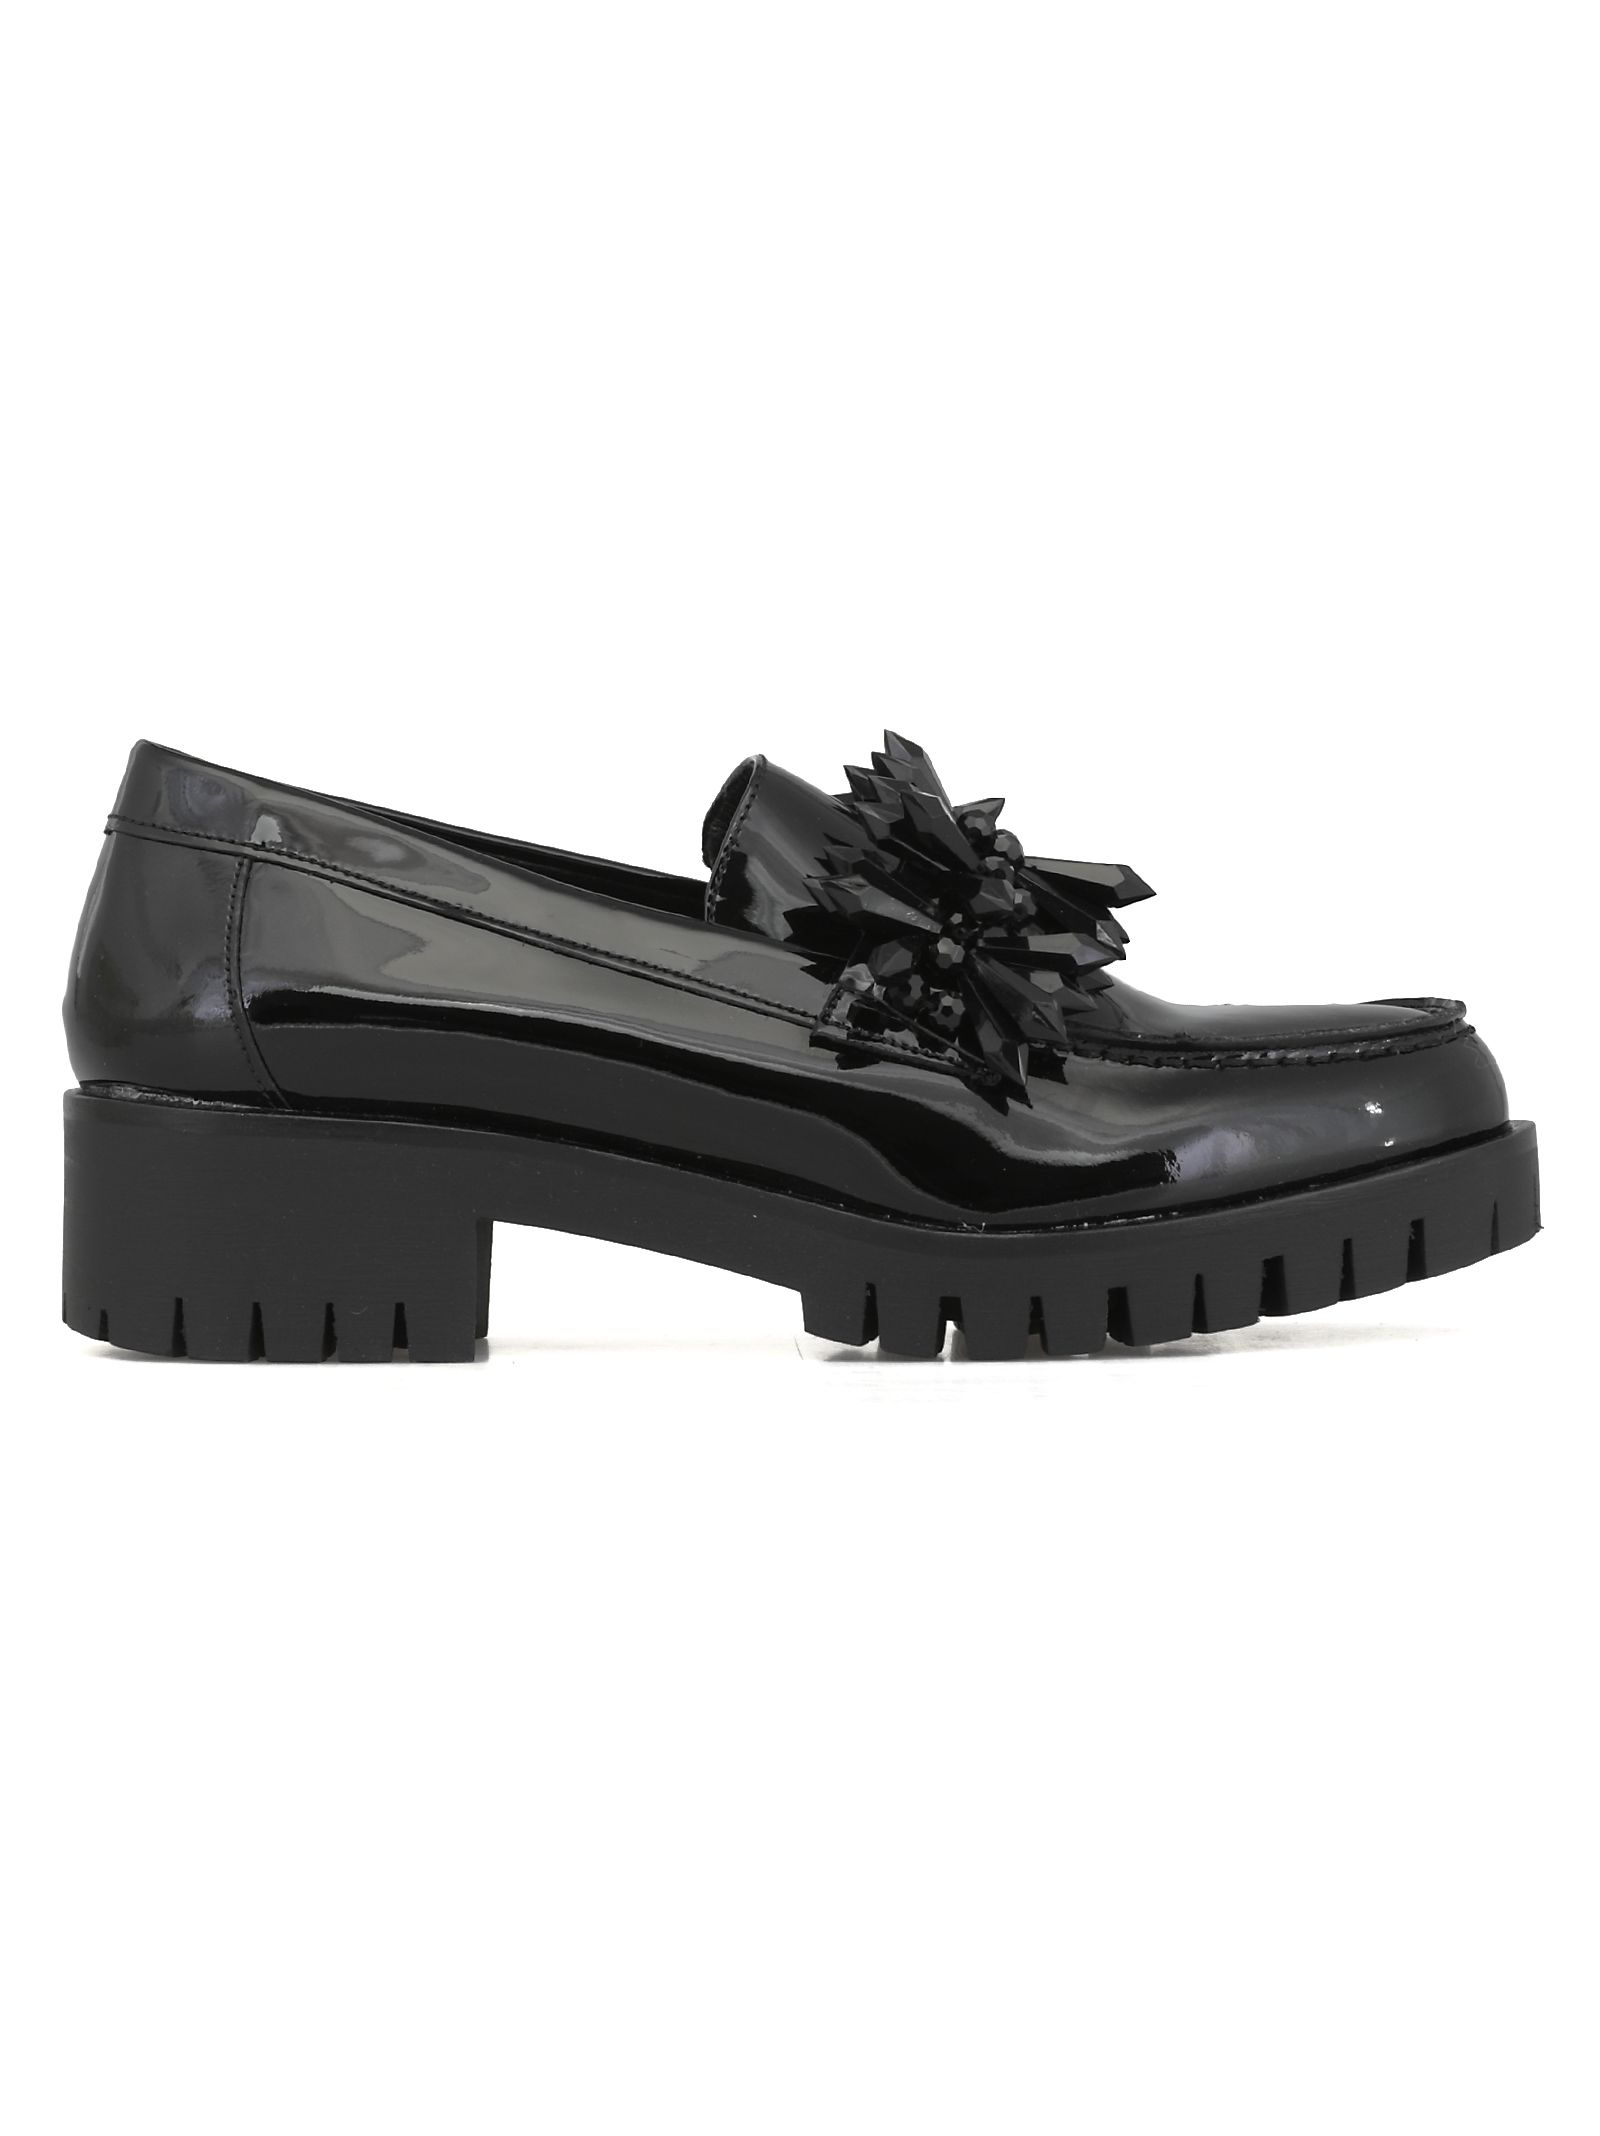 CULT Slayer Low Shoe in Black